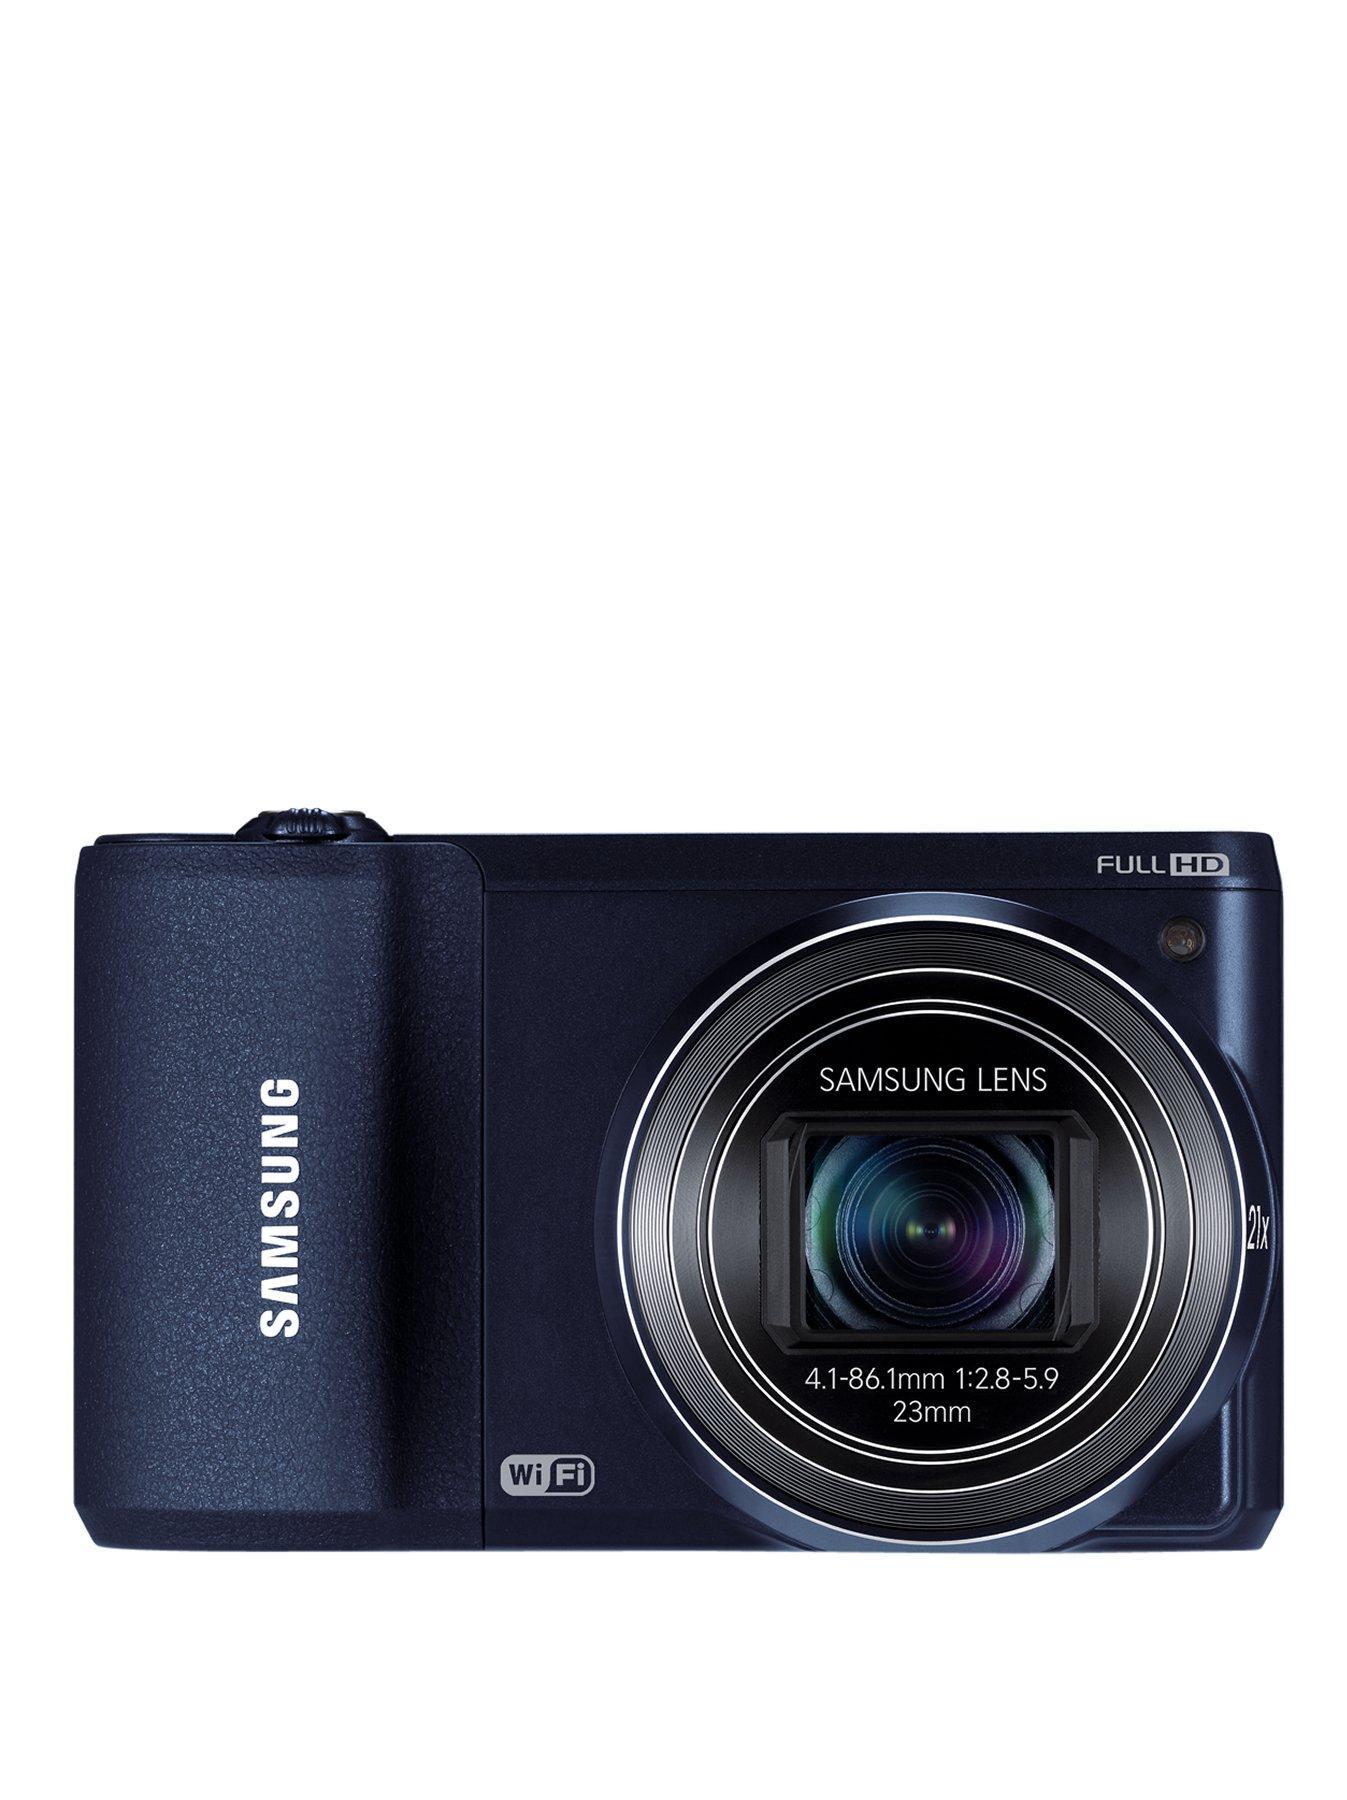 Cellulari fotocamera 5 megapixel prezzi 73